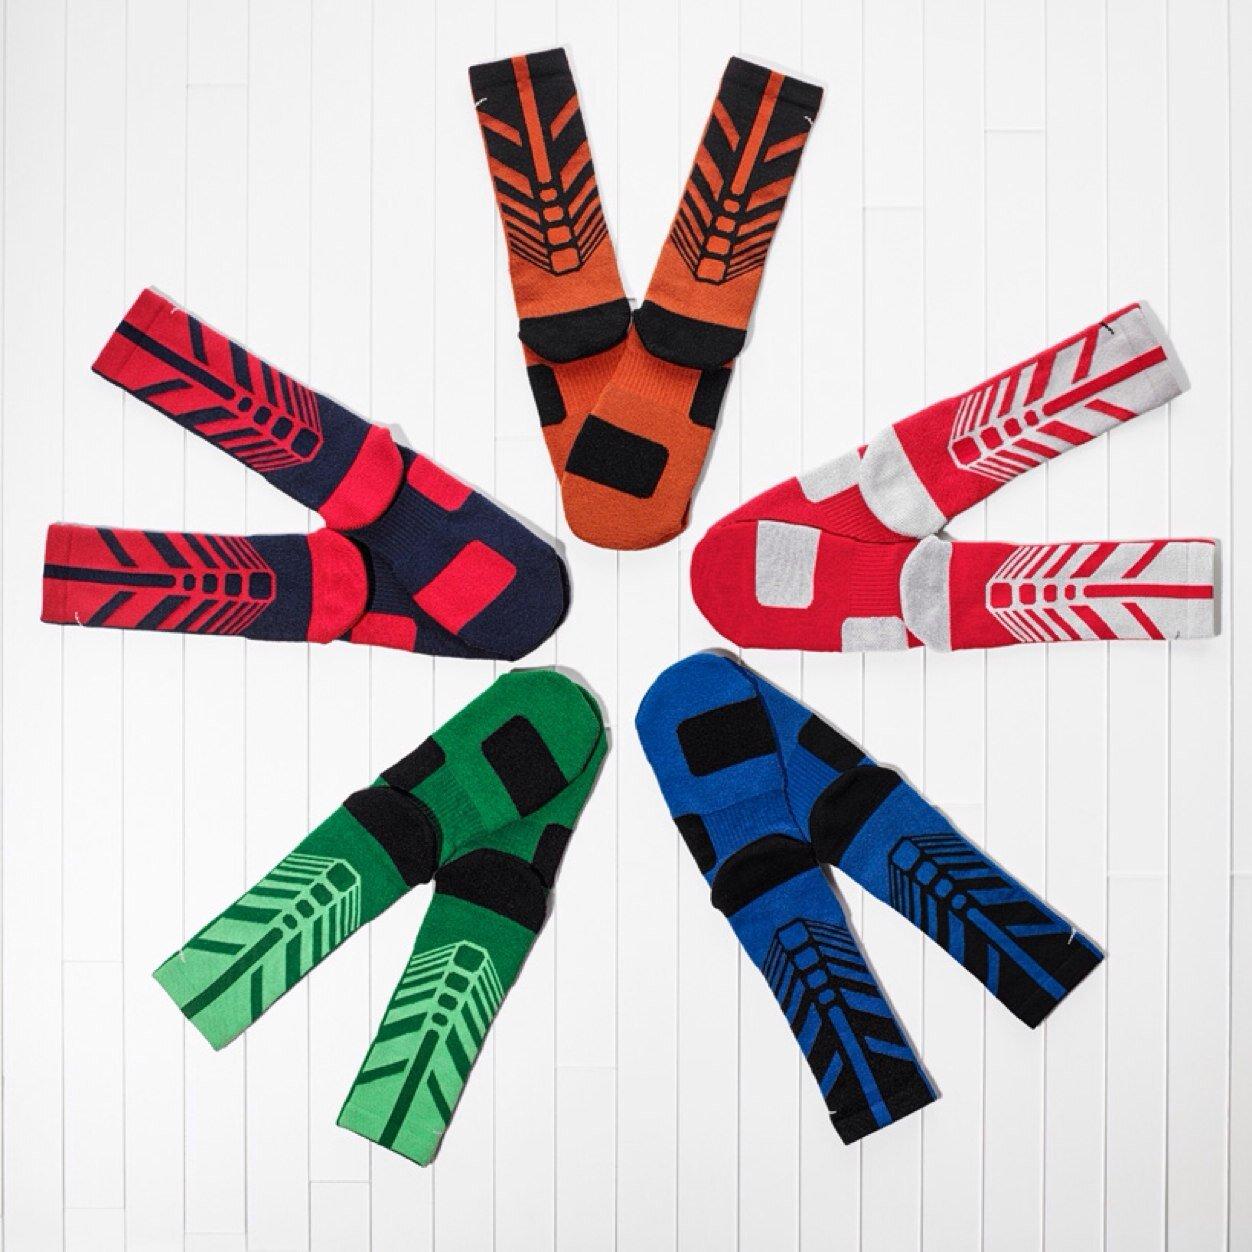 Sock Game Weak - Sock Game Weak (@sock_game_weak) Twitter